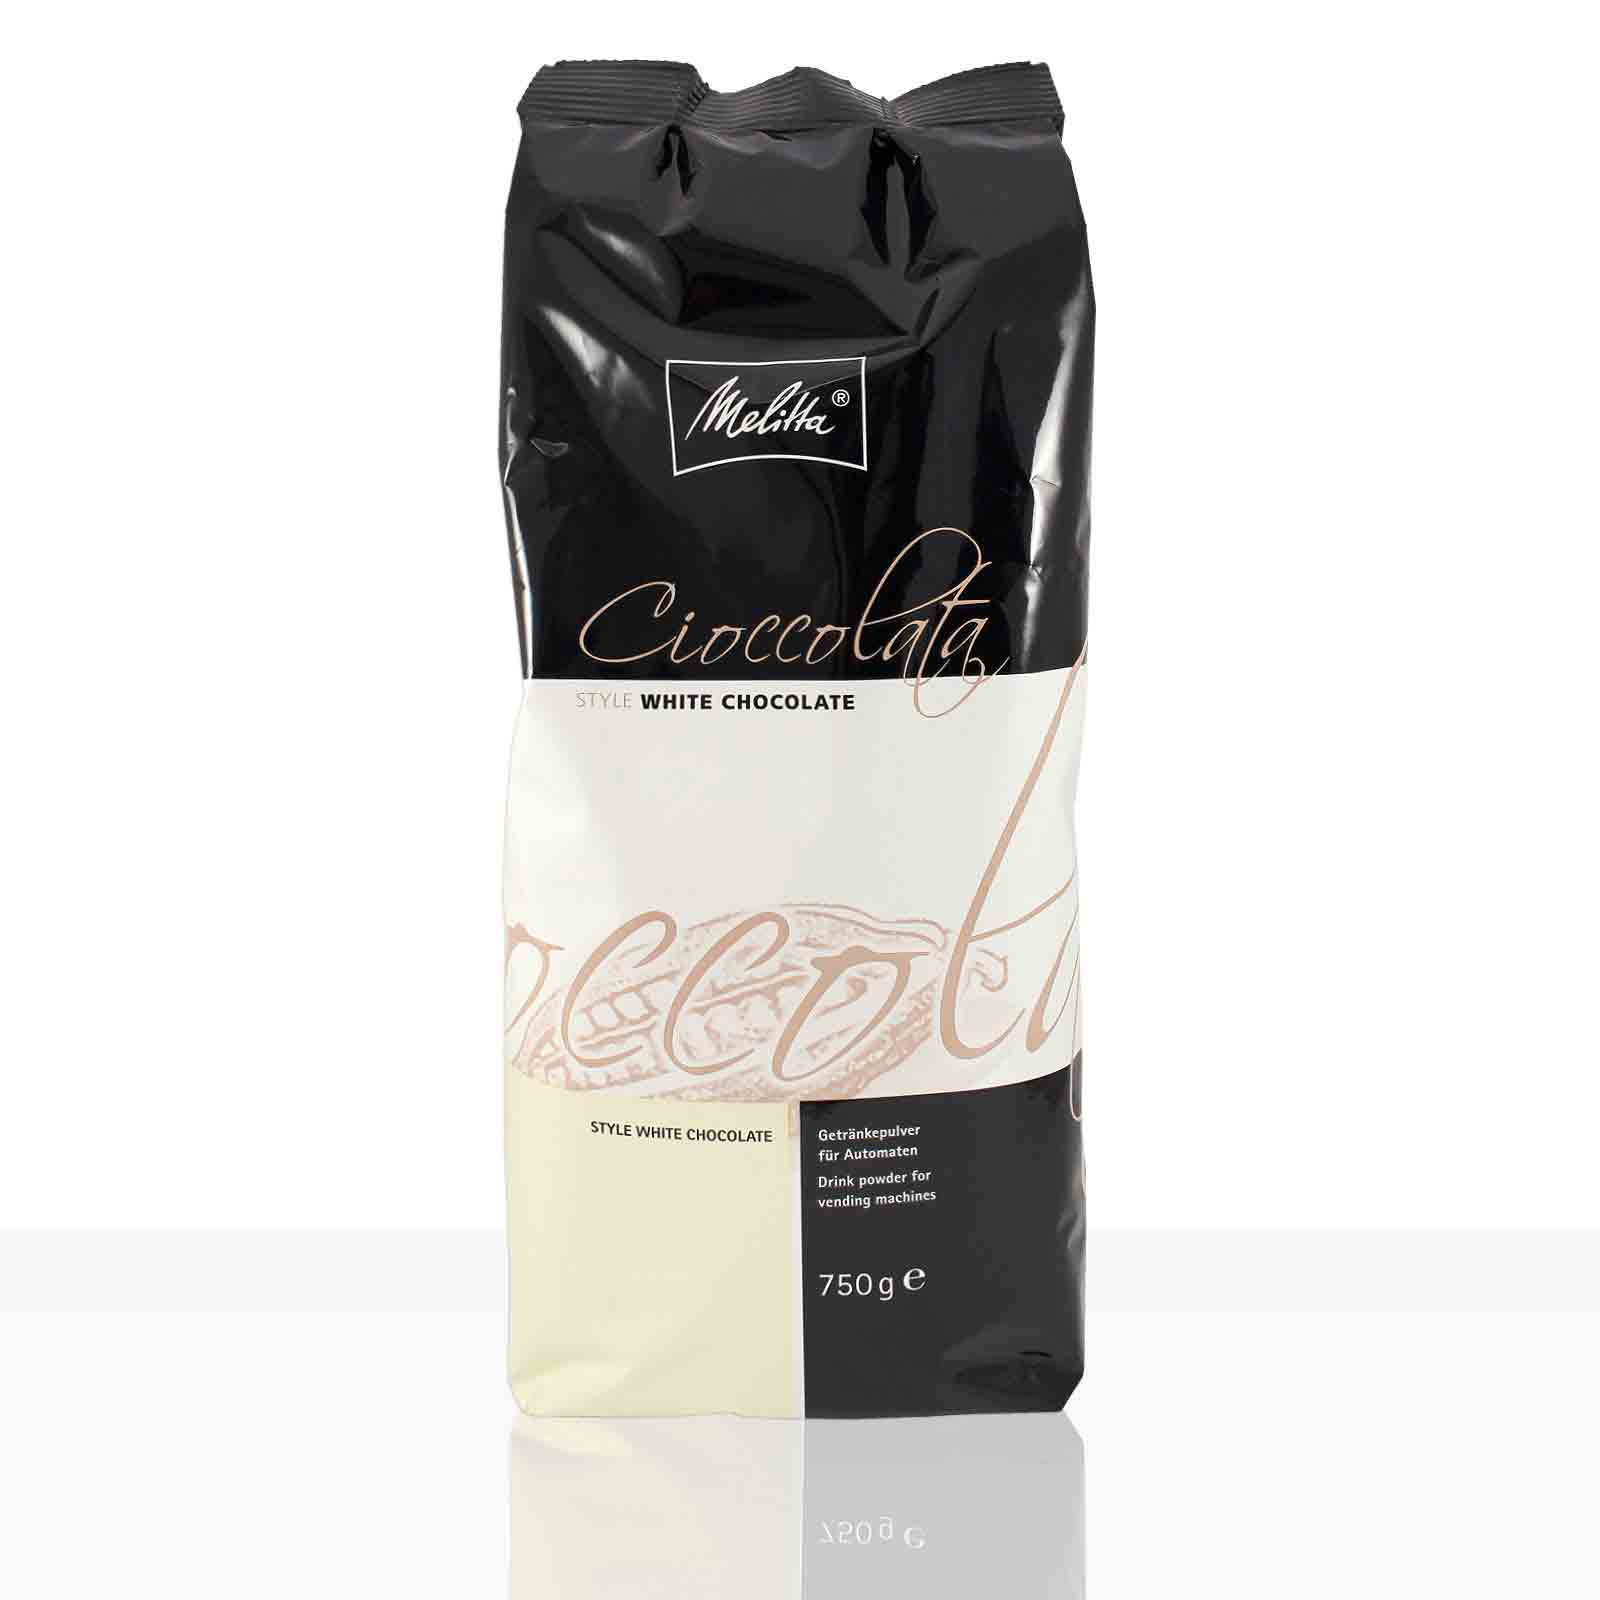 Melitta Cioccolata Style White Chocolate 750g, weiße Instant-Schokolade